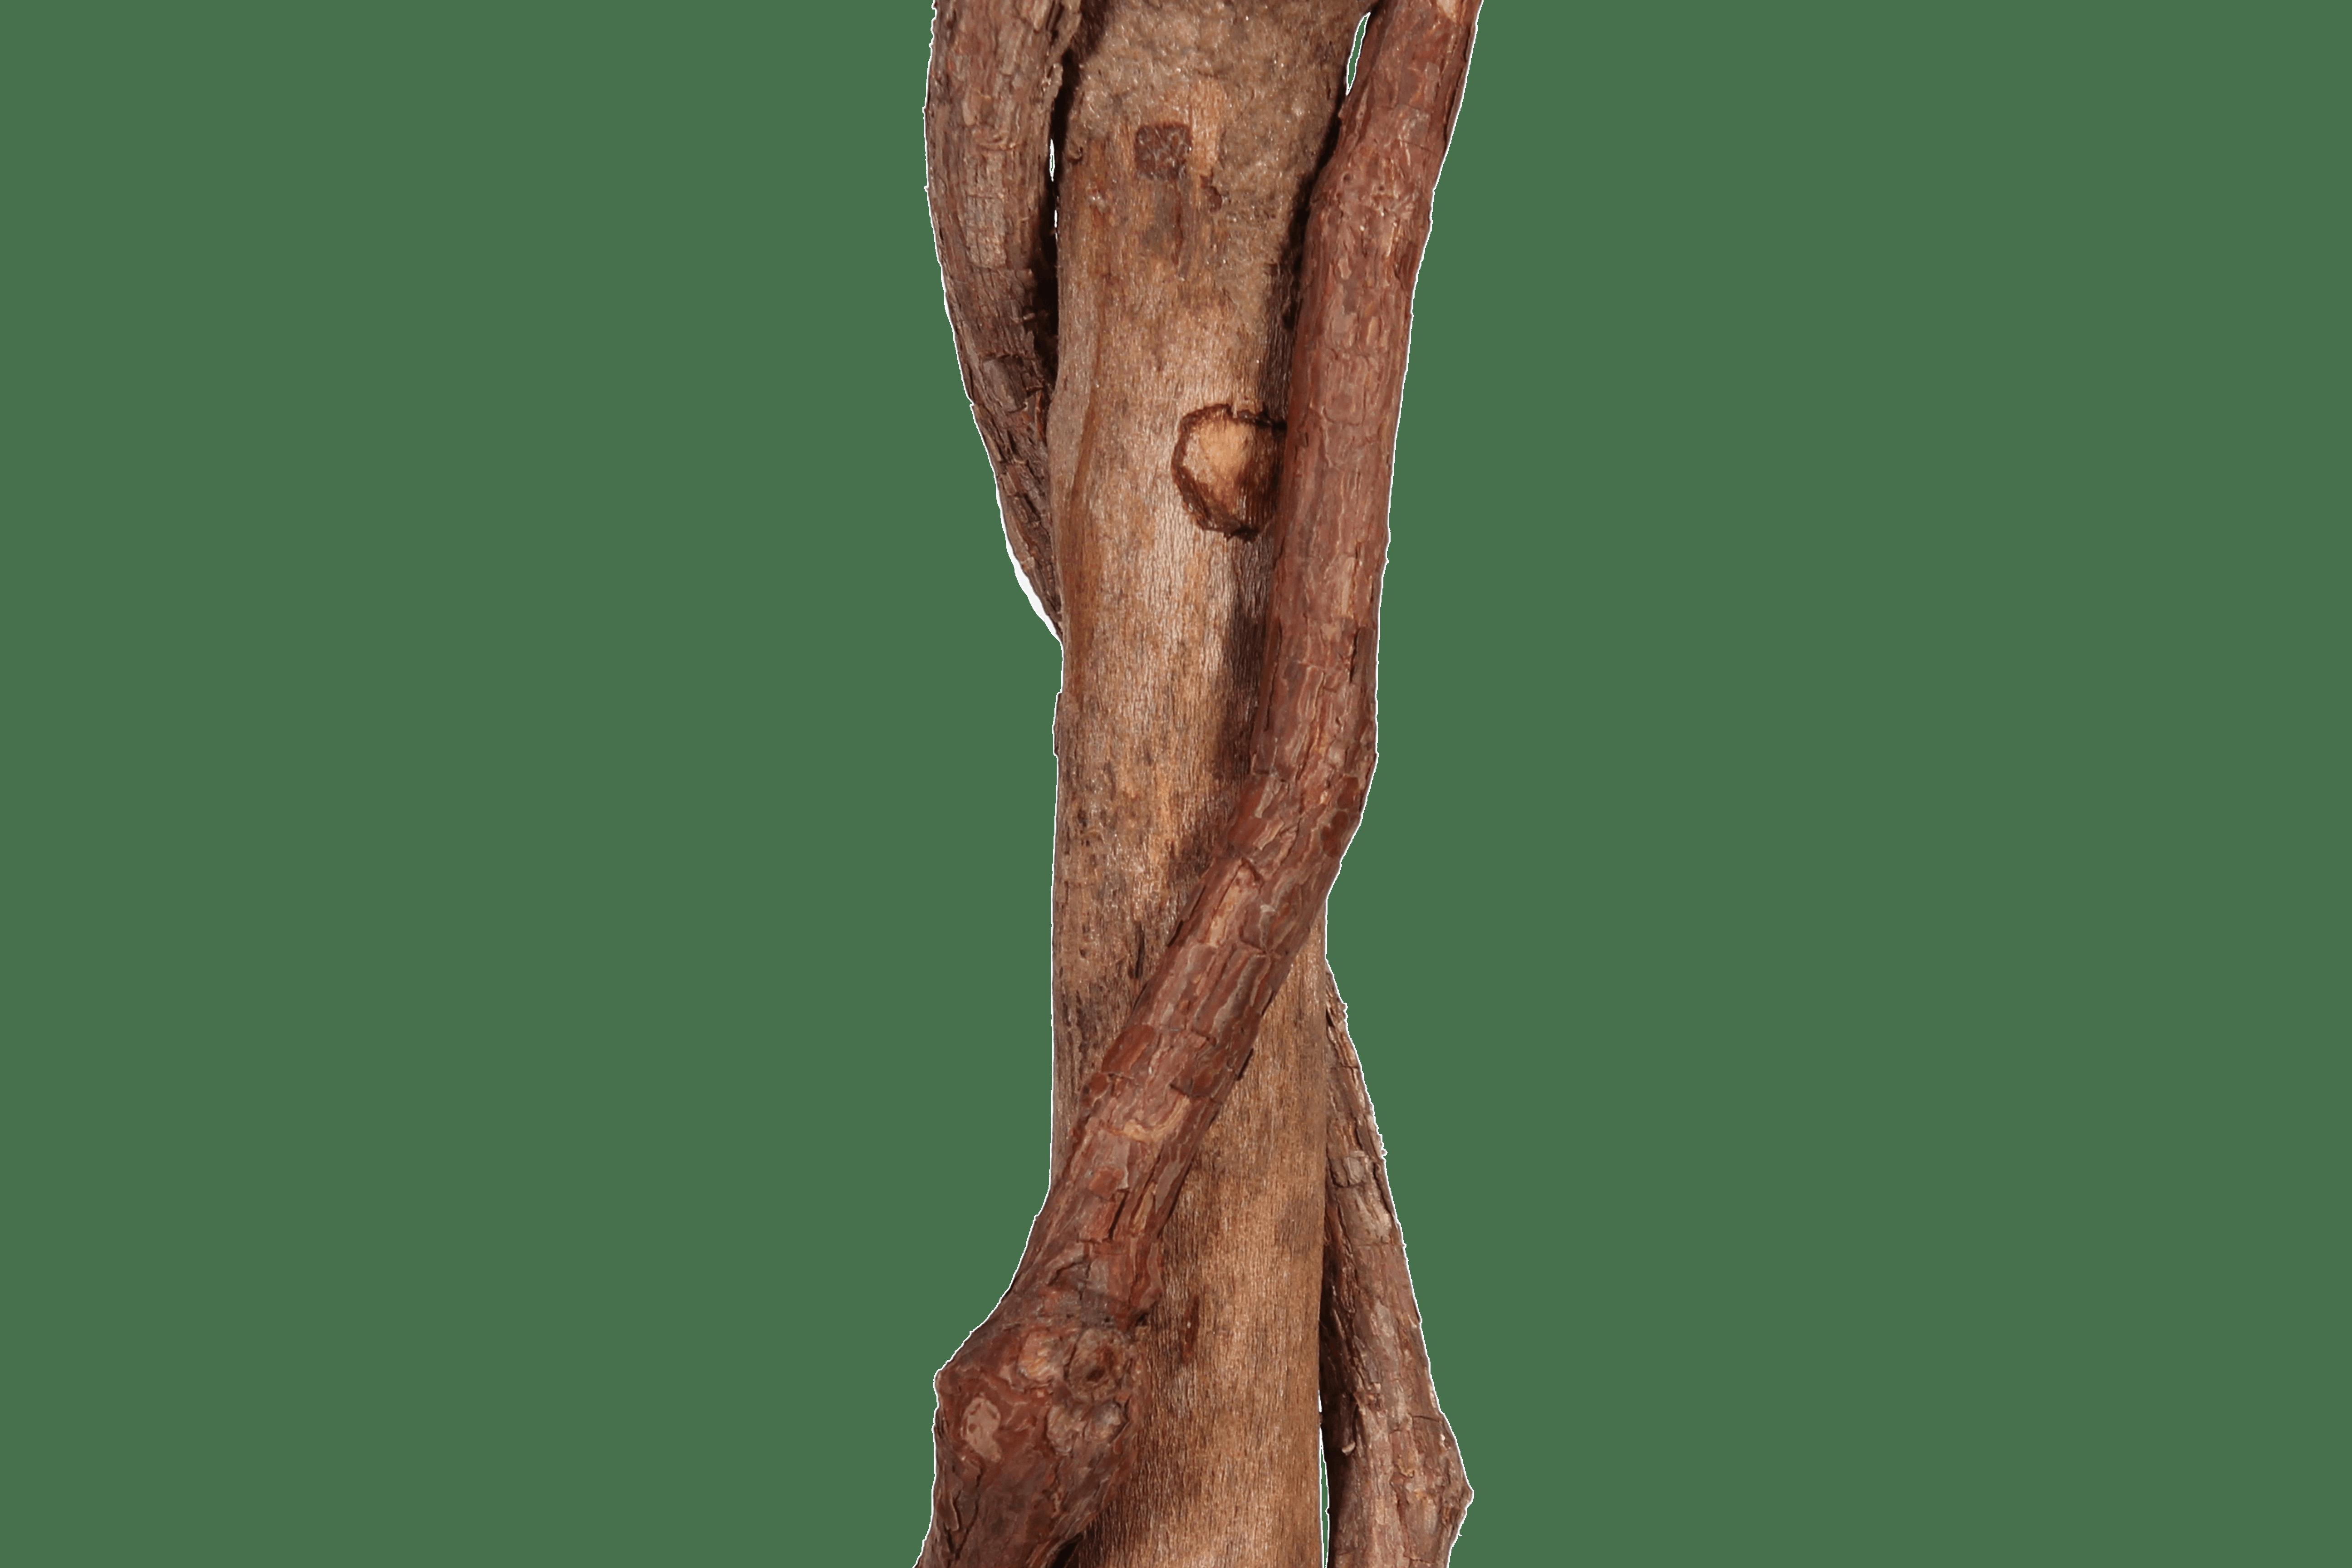 Artificial bay tree stem close up